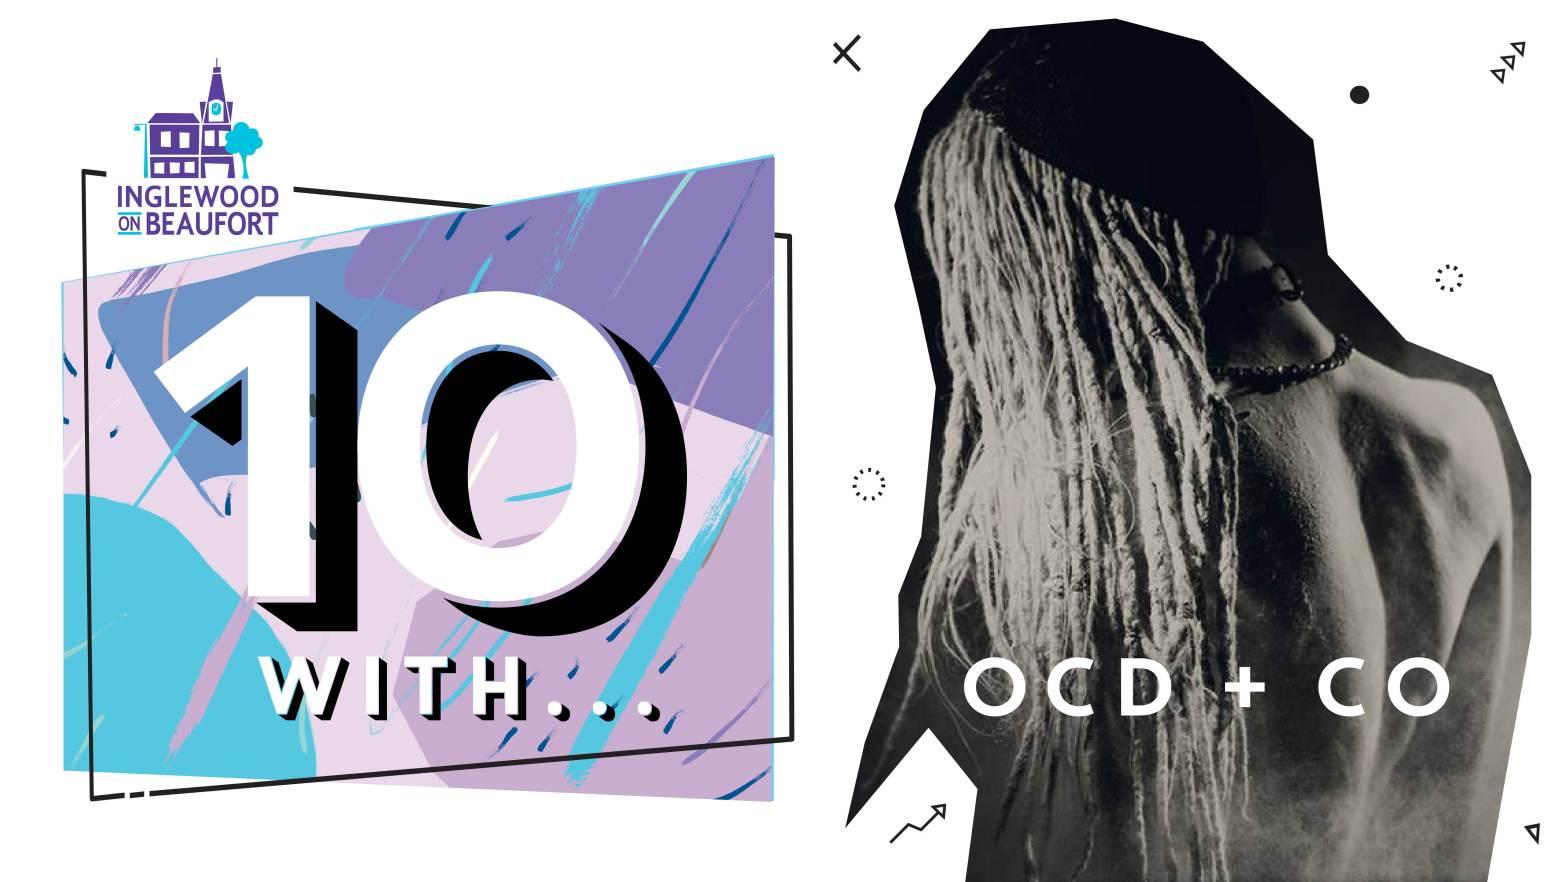 Inglewood On Beaufort and OCD+Co dreadlock hairdresser